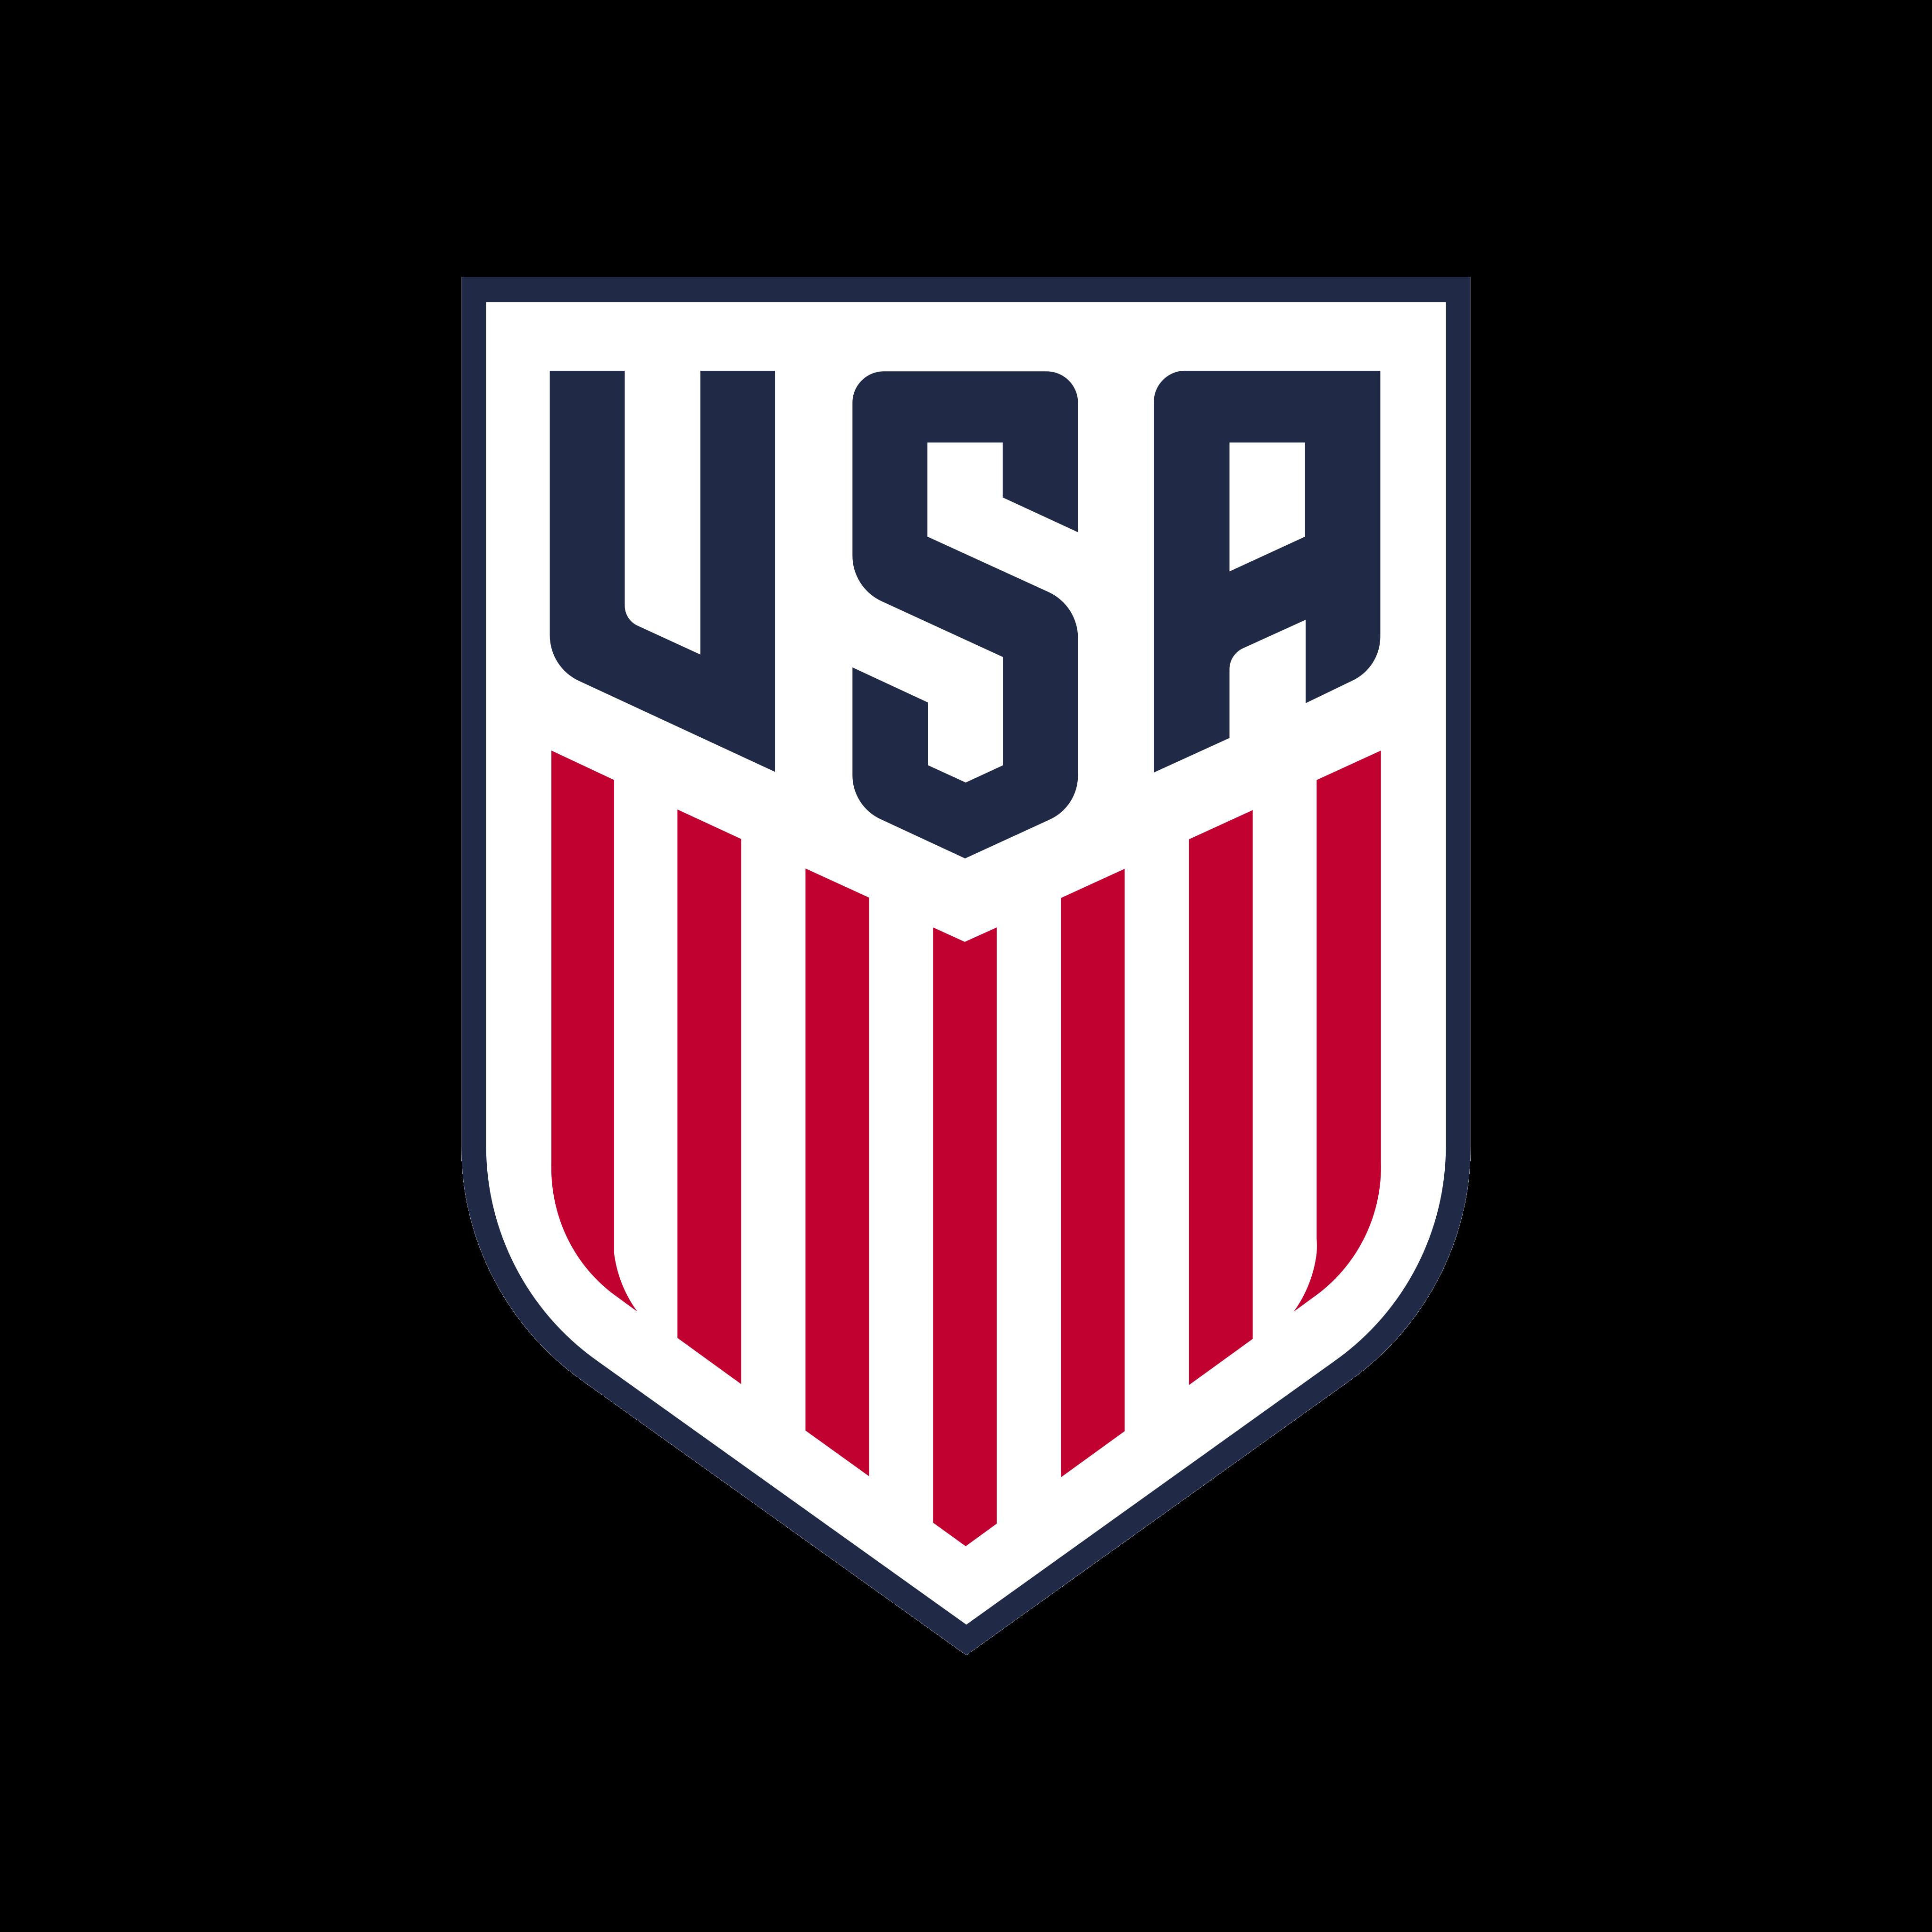 united states national soccer team logo 0 - United States National Soccer Team Logo